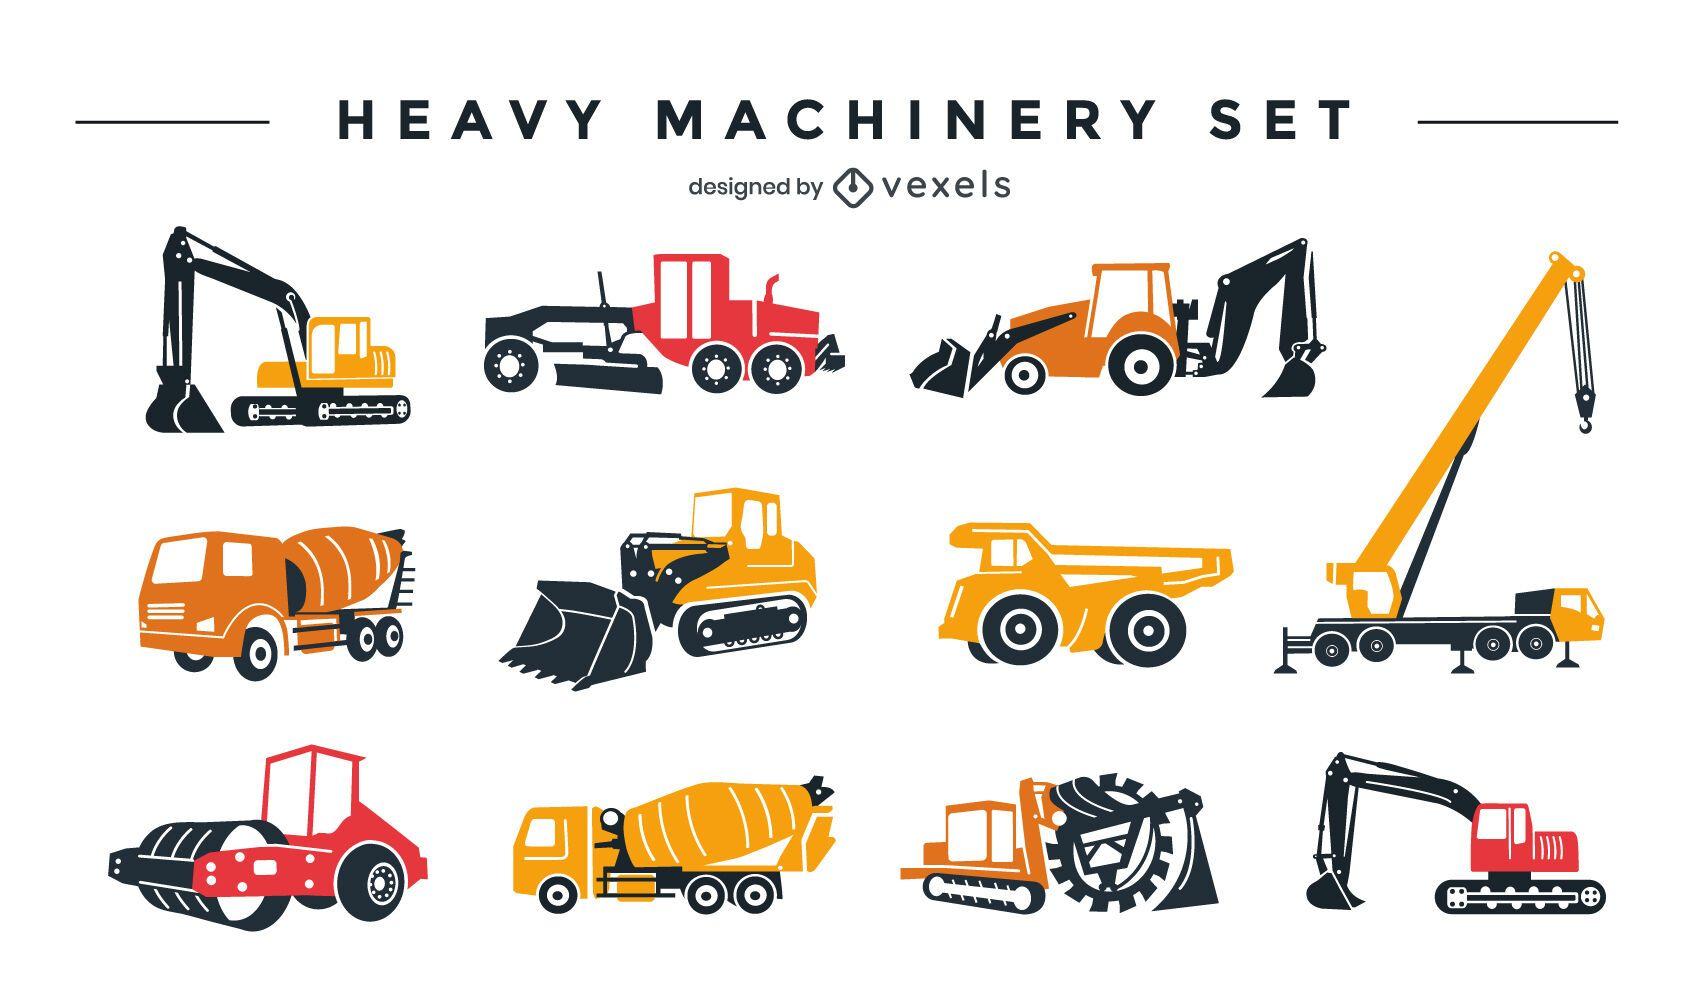 Heavy machinery design set